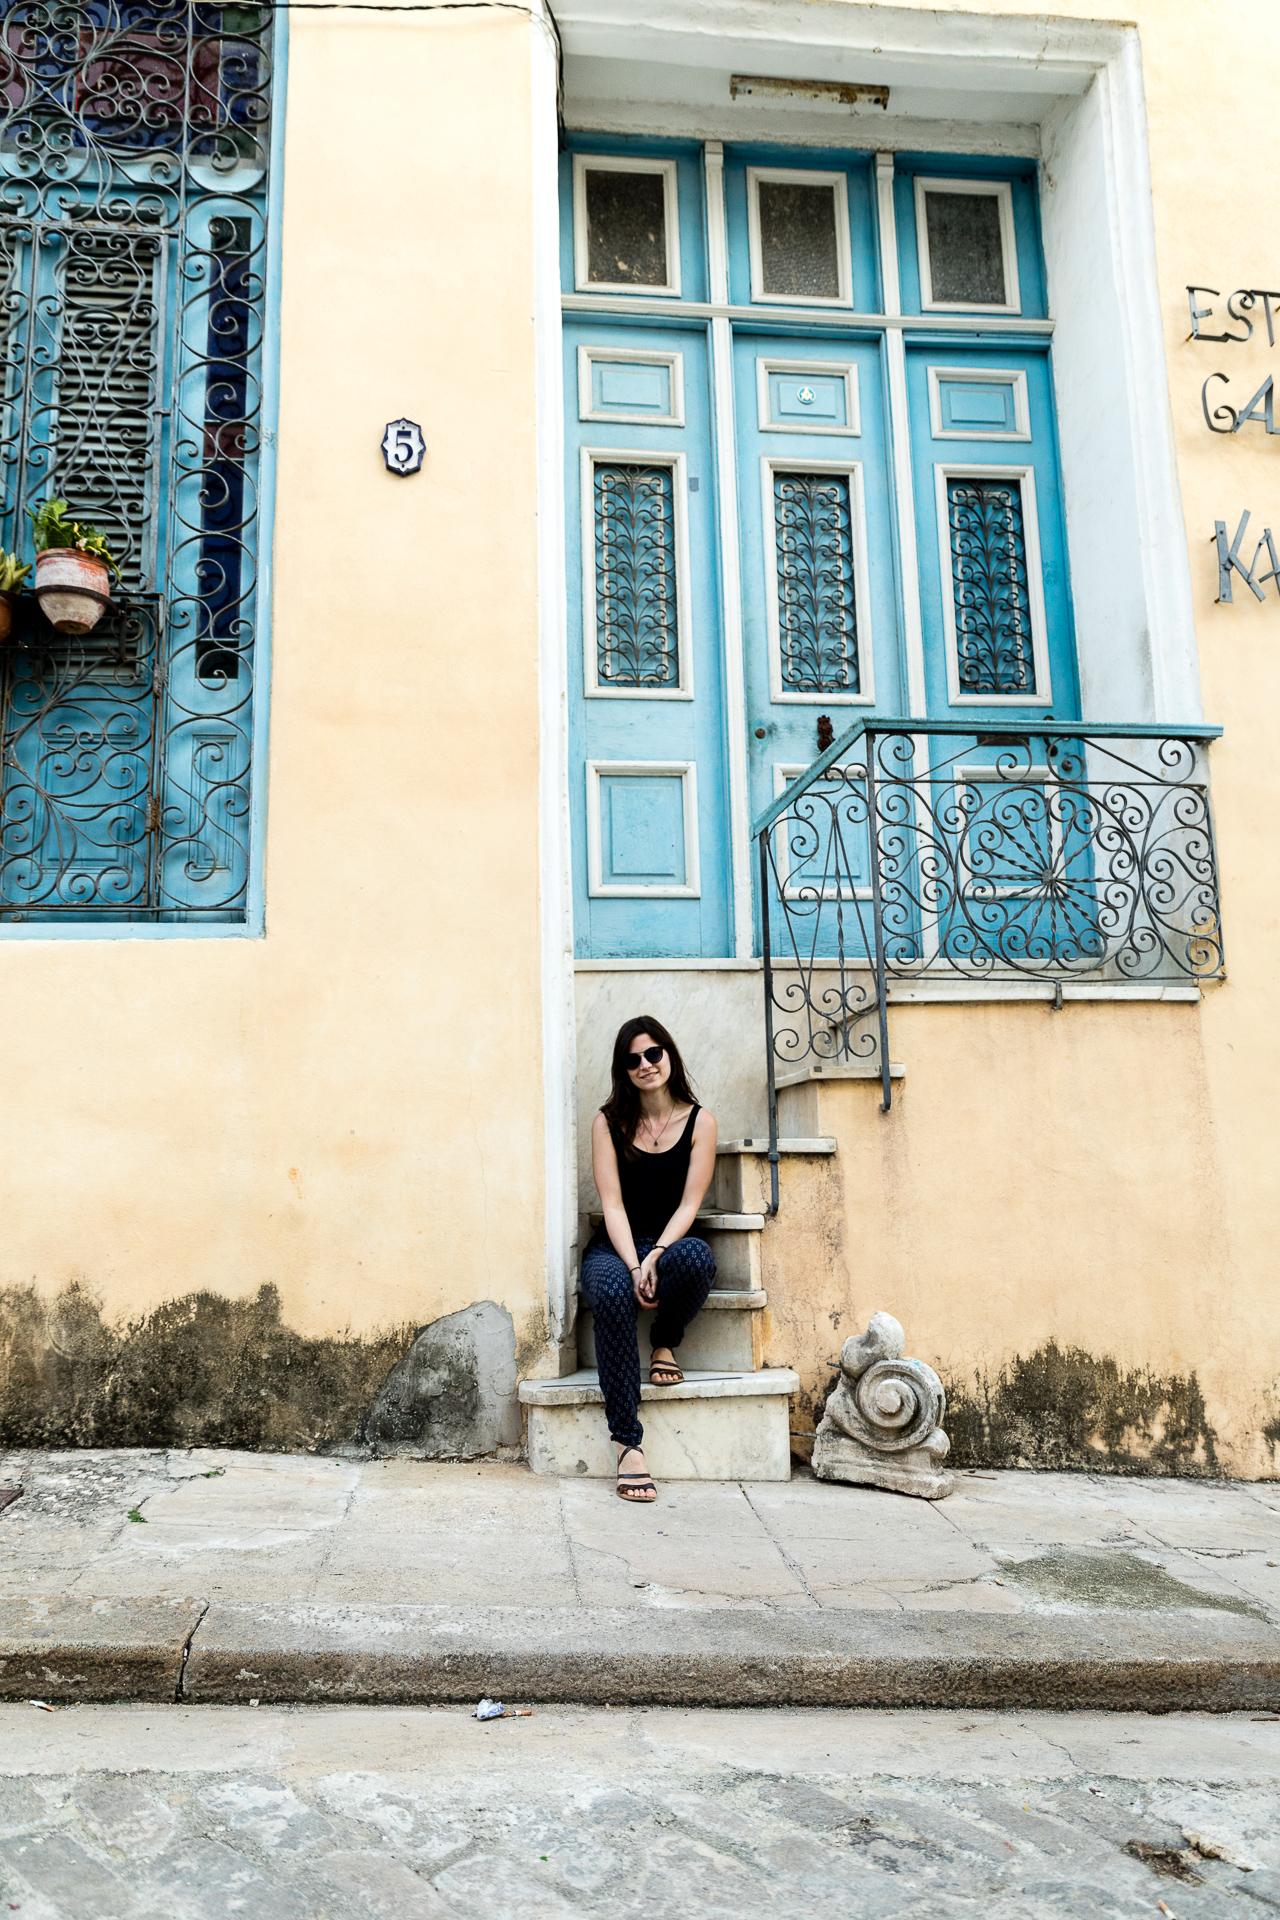 Bild: Hauseingang in Habana Vieja Havanna Kuba